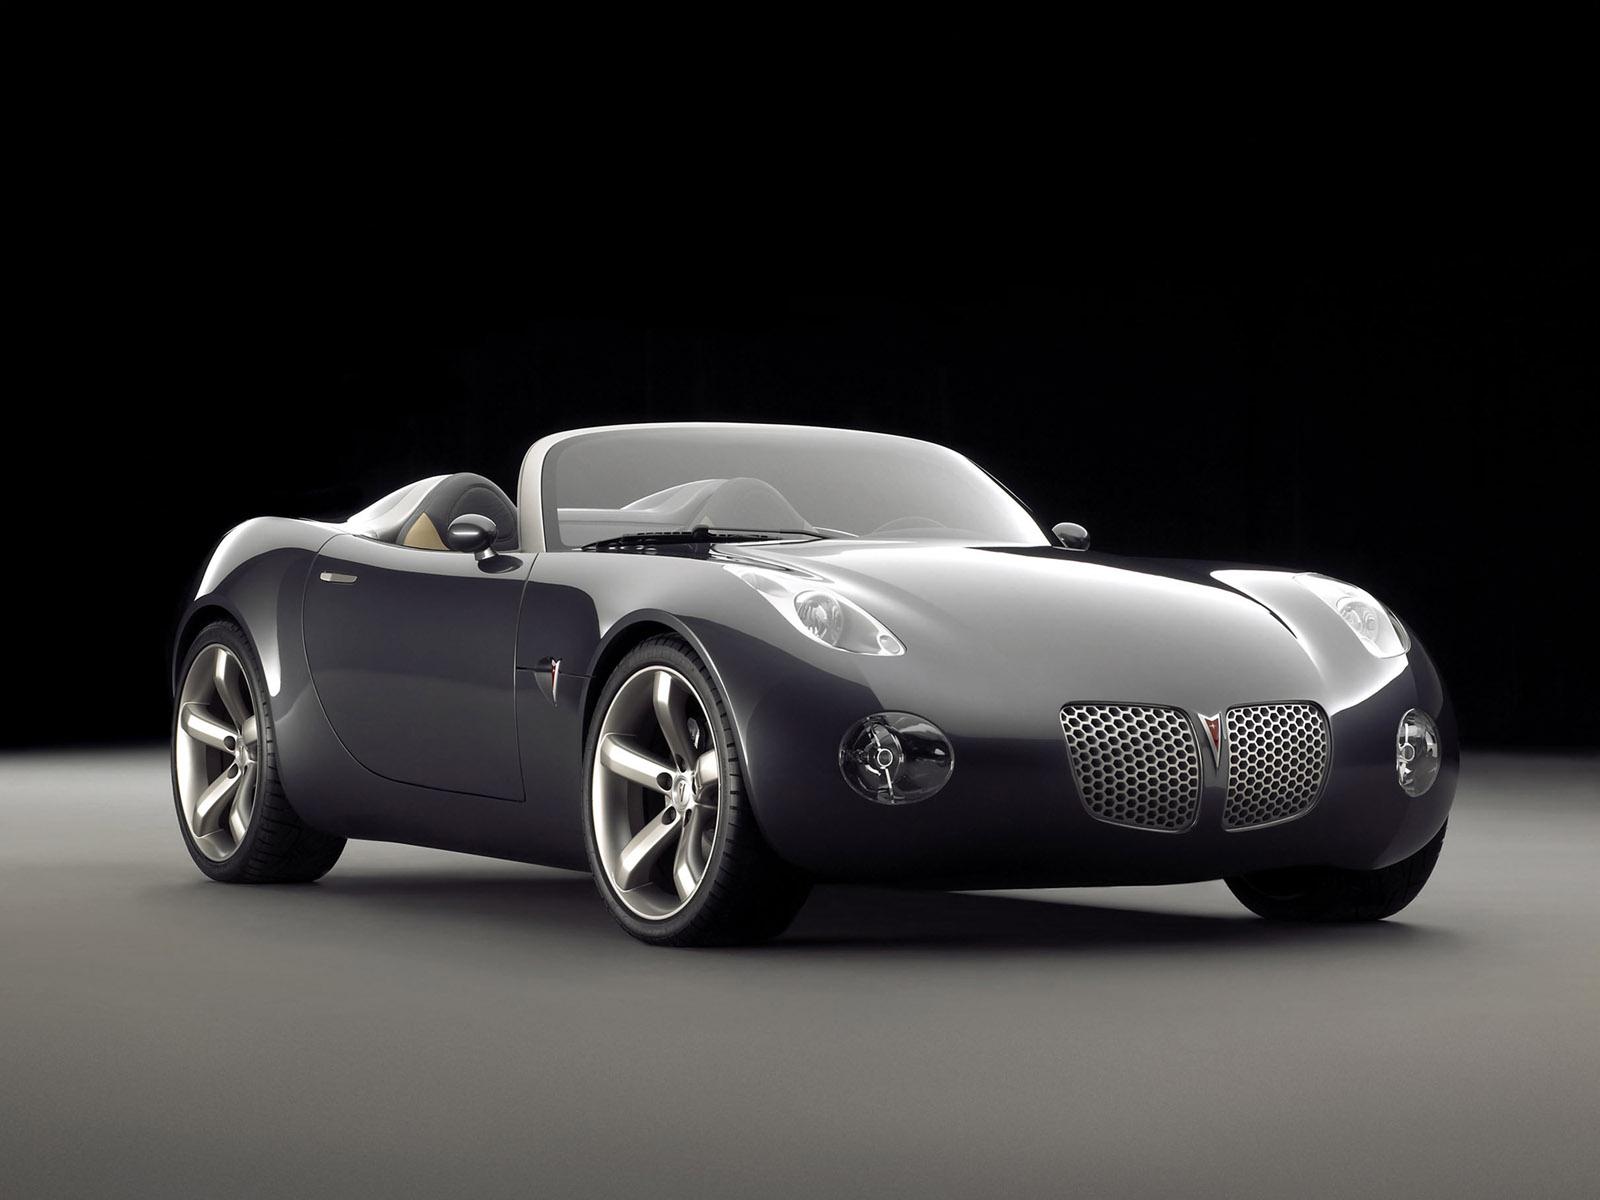 Pontiac Solstice Roadster Concept photo #1